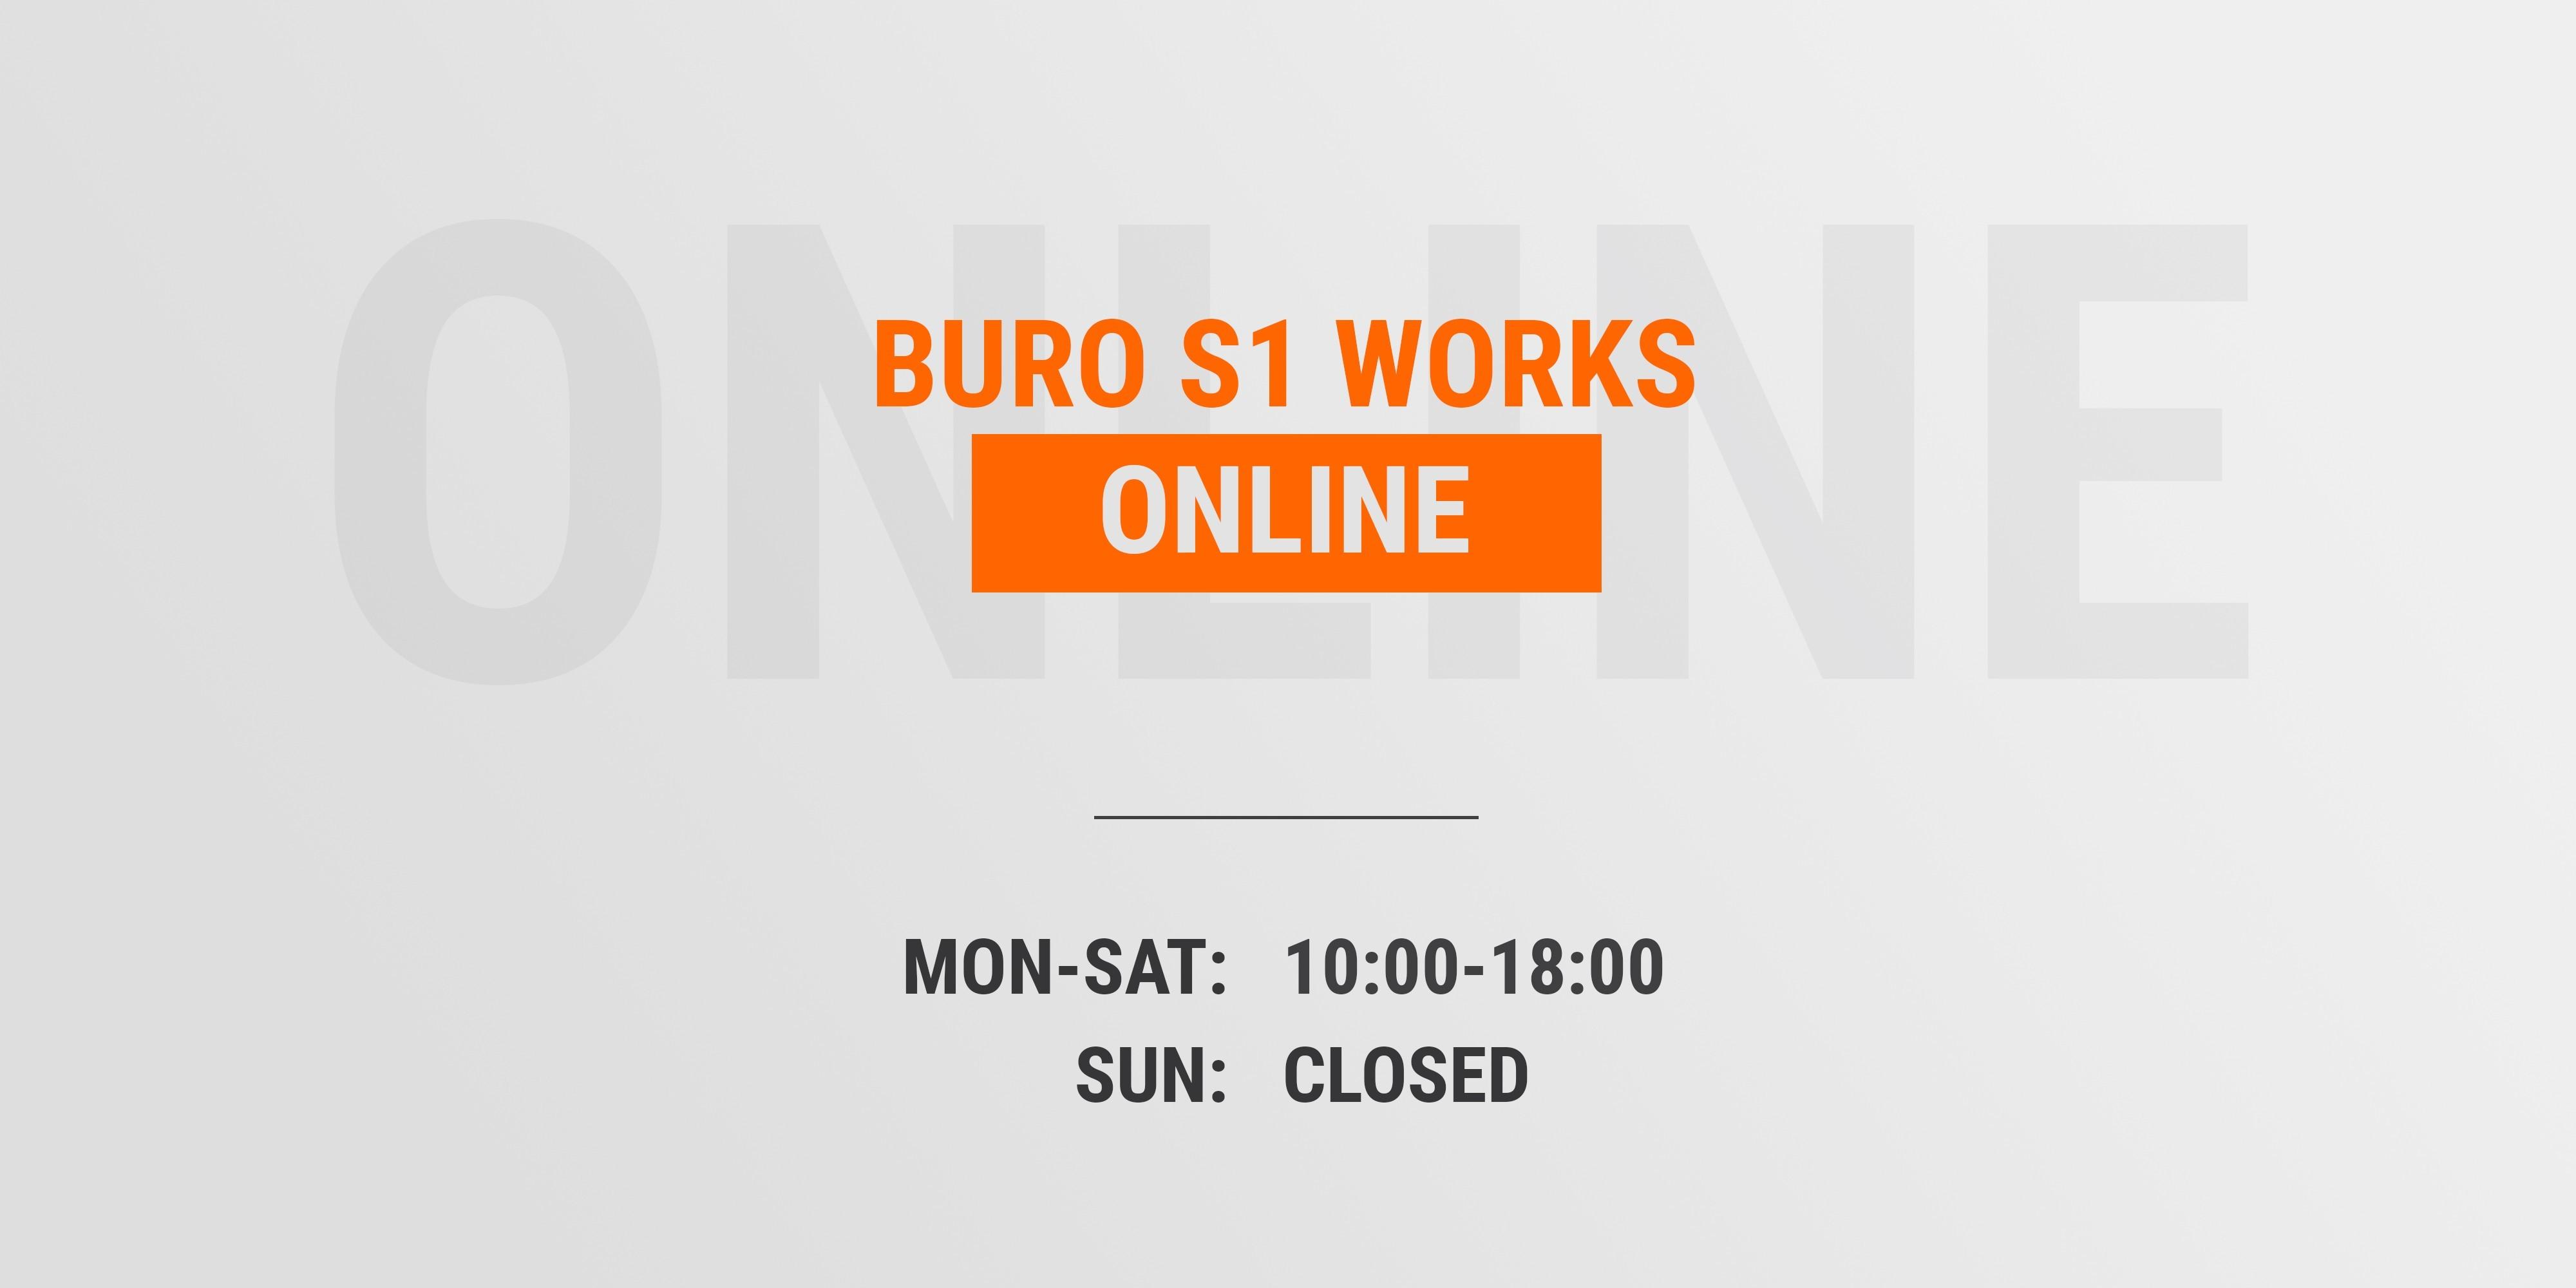 Buro S1 works online